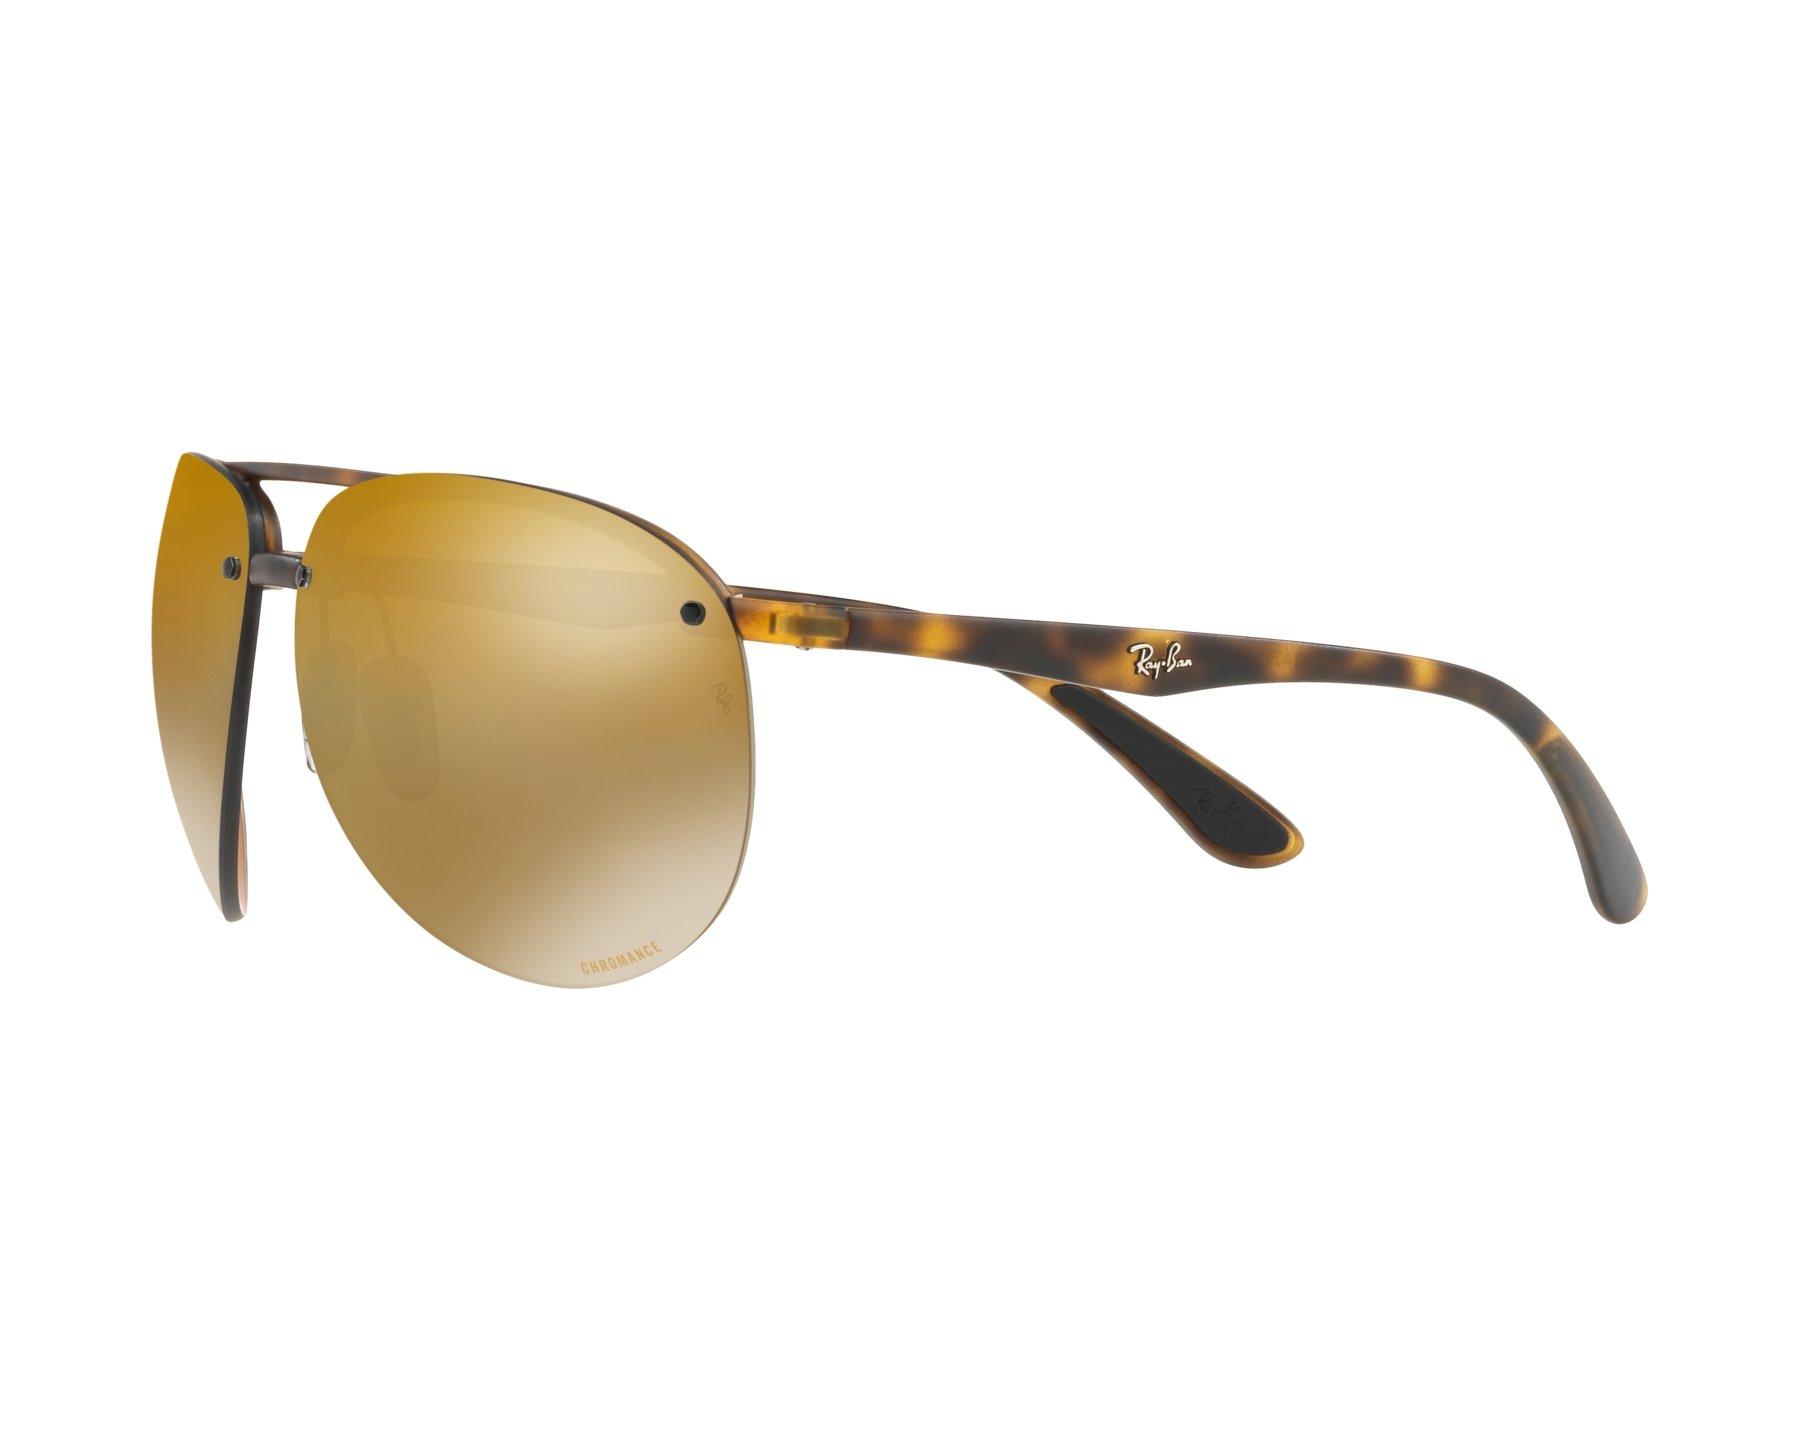 daf2ea56a4 Sunglasses Ray-Ban RB-4293-CH 894 A3 64-13 Havana